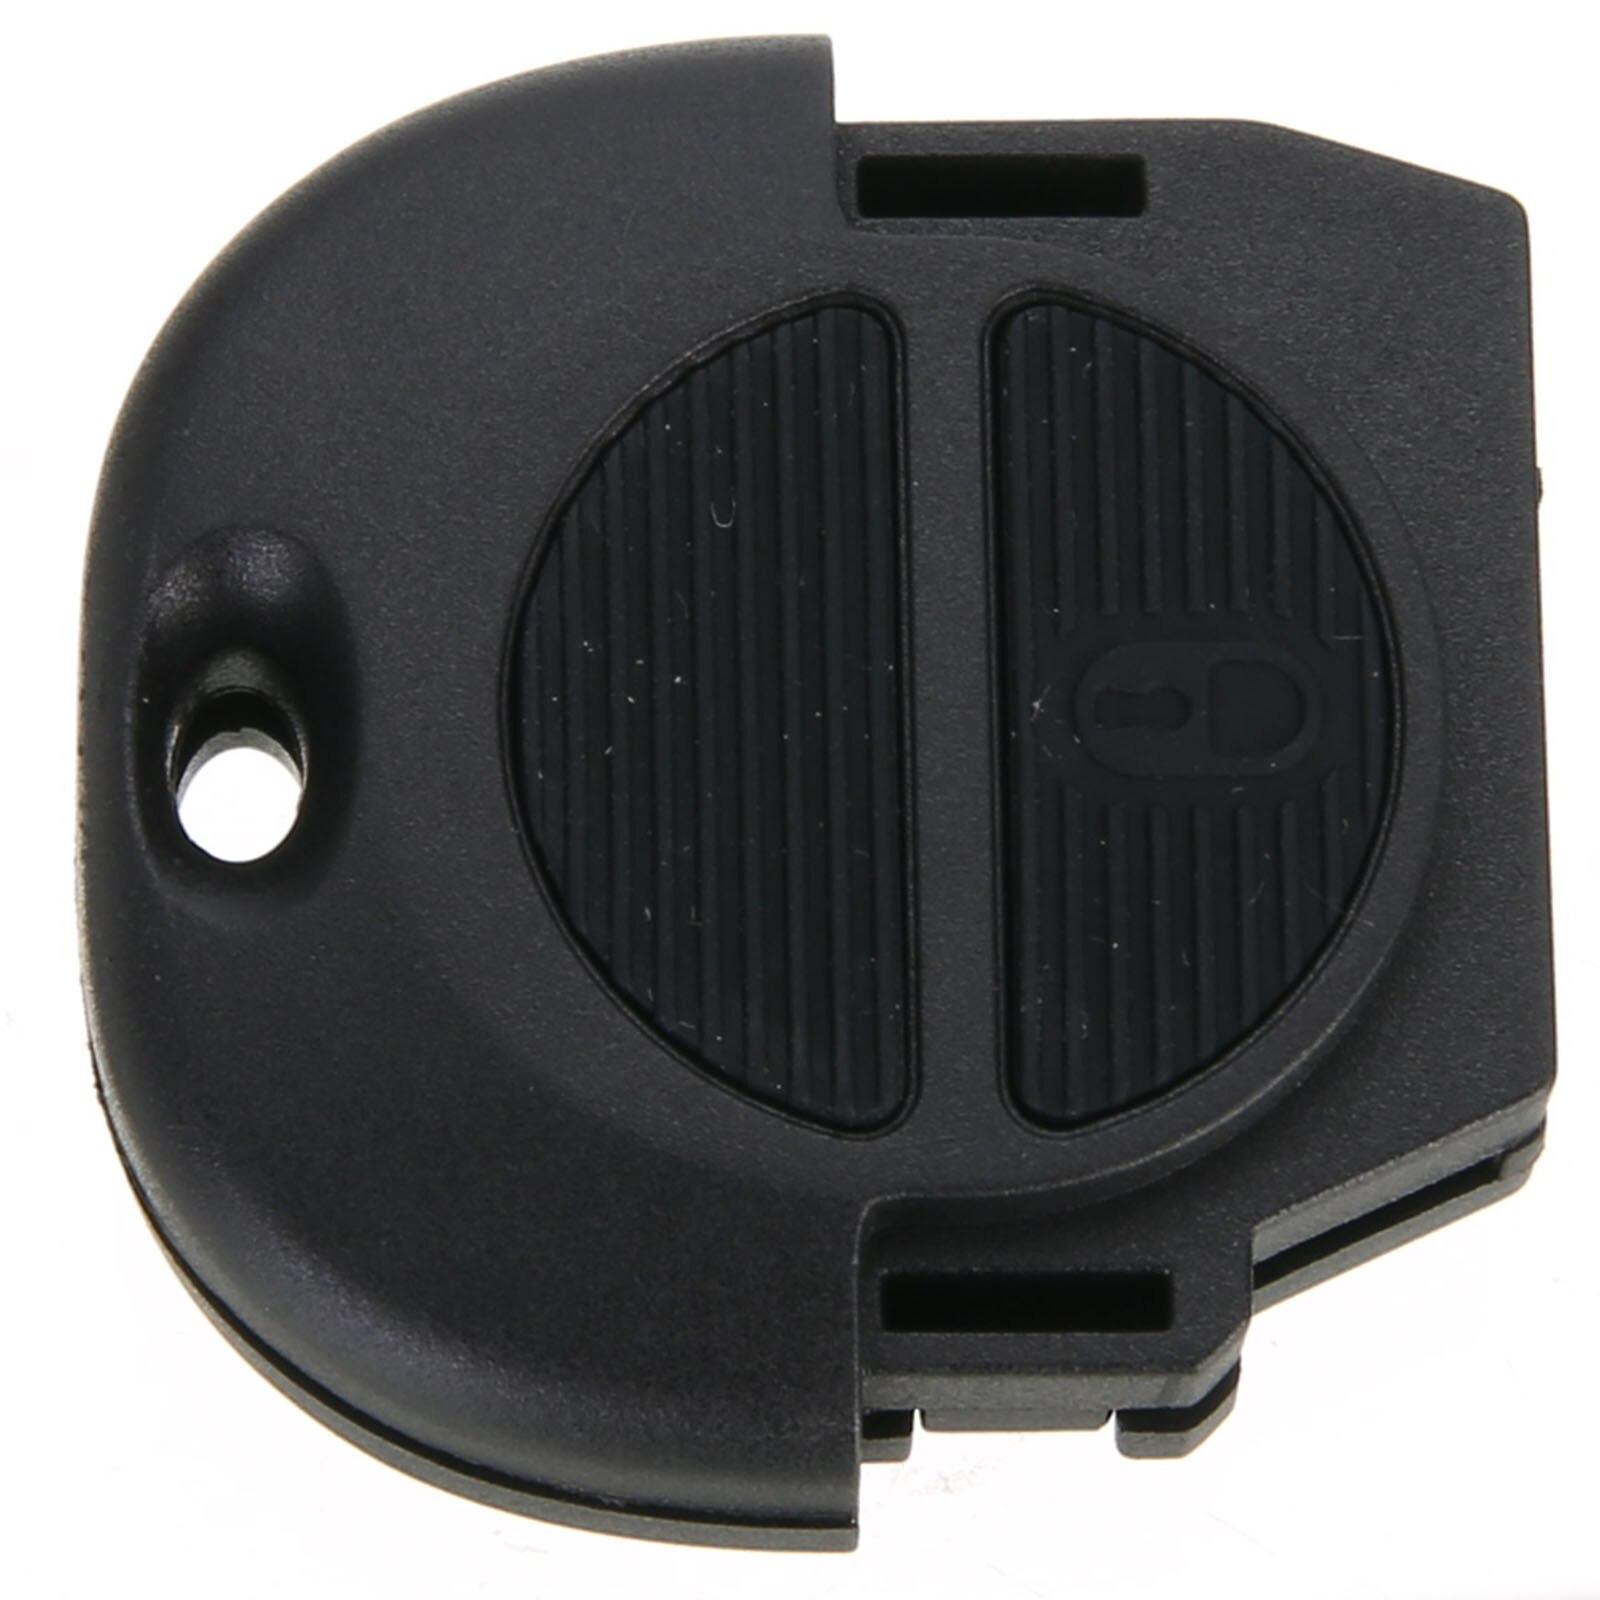 Mayitr 1pc 2 Buttons Remote Key Fob Shell Case For Nissan Almera Central Locking Wiring Diagram Plastic Car Micra X